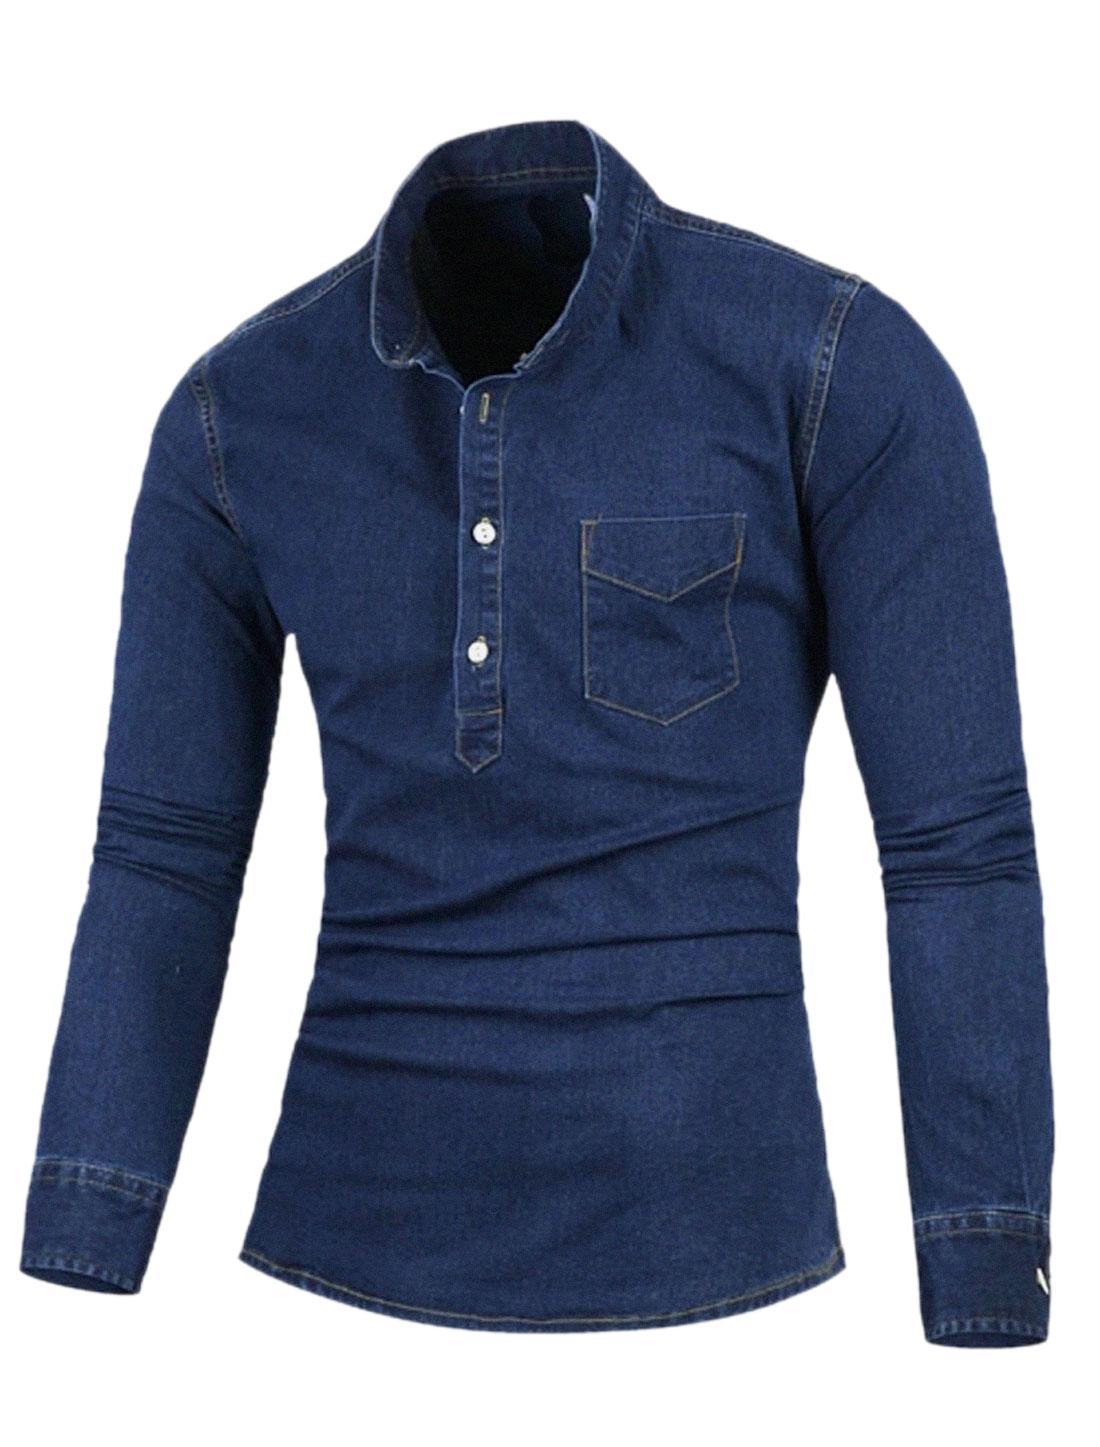 Men Long Sleeve Chest Pocket Casual Denim T-Shirt Navy Blue S